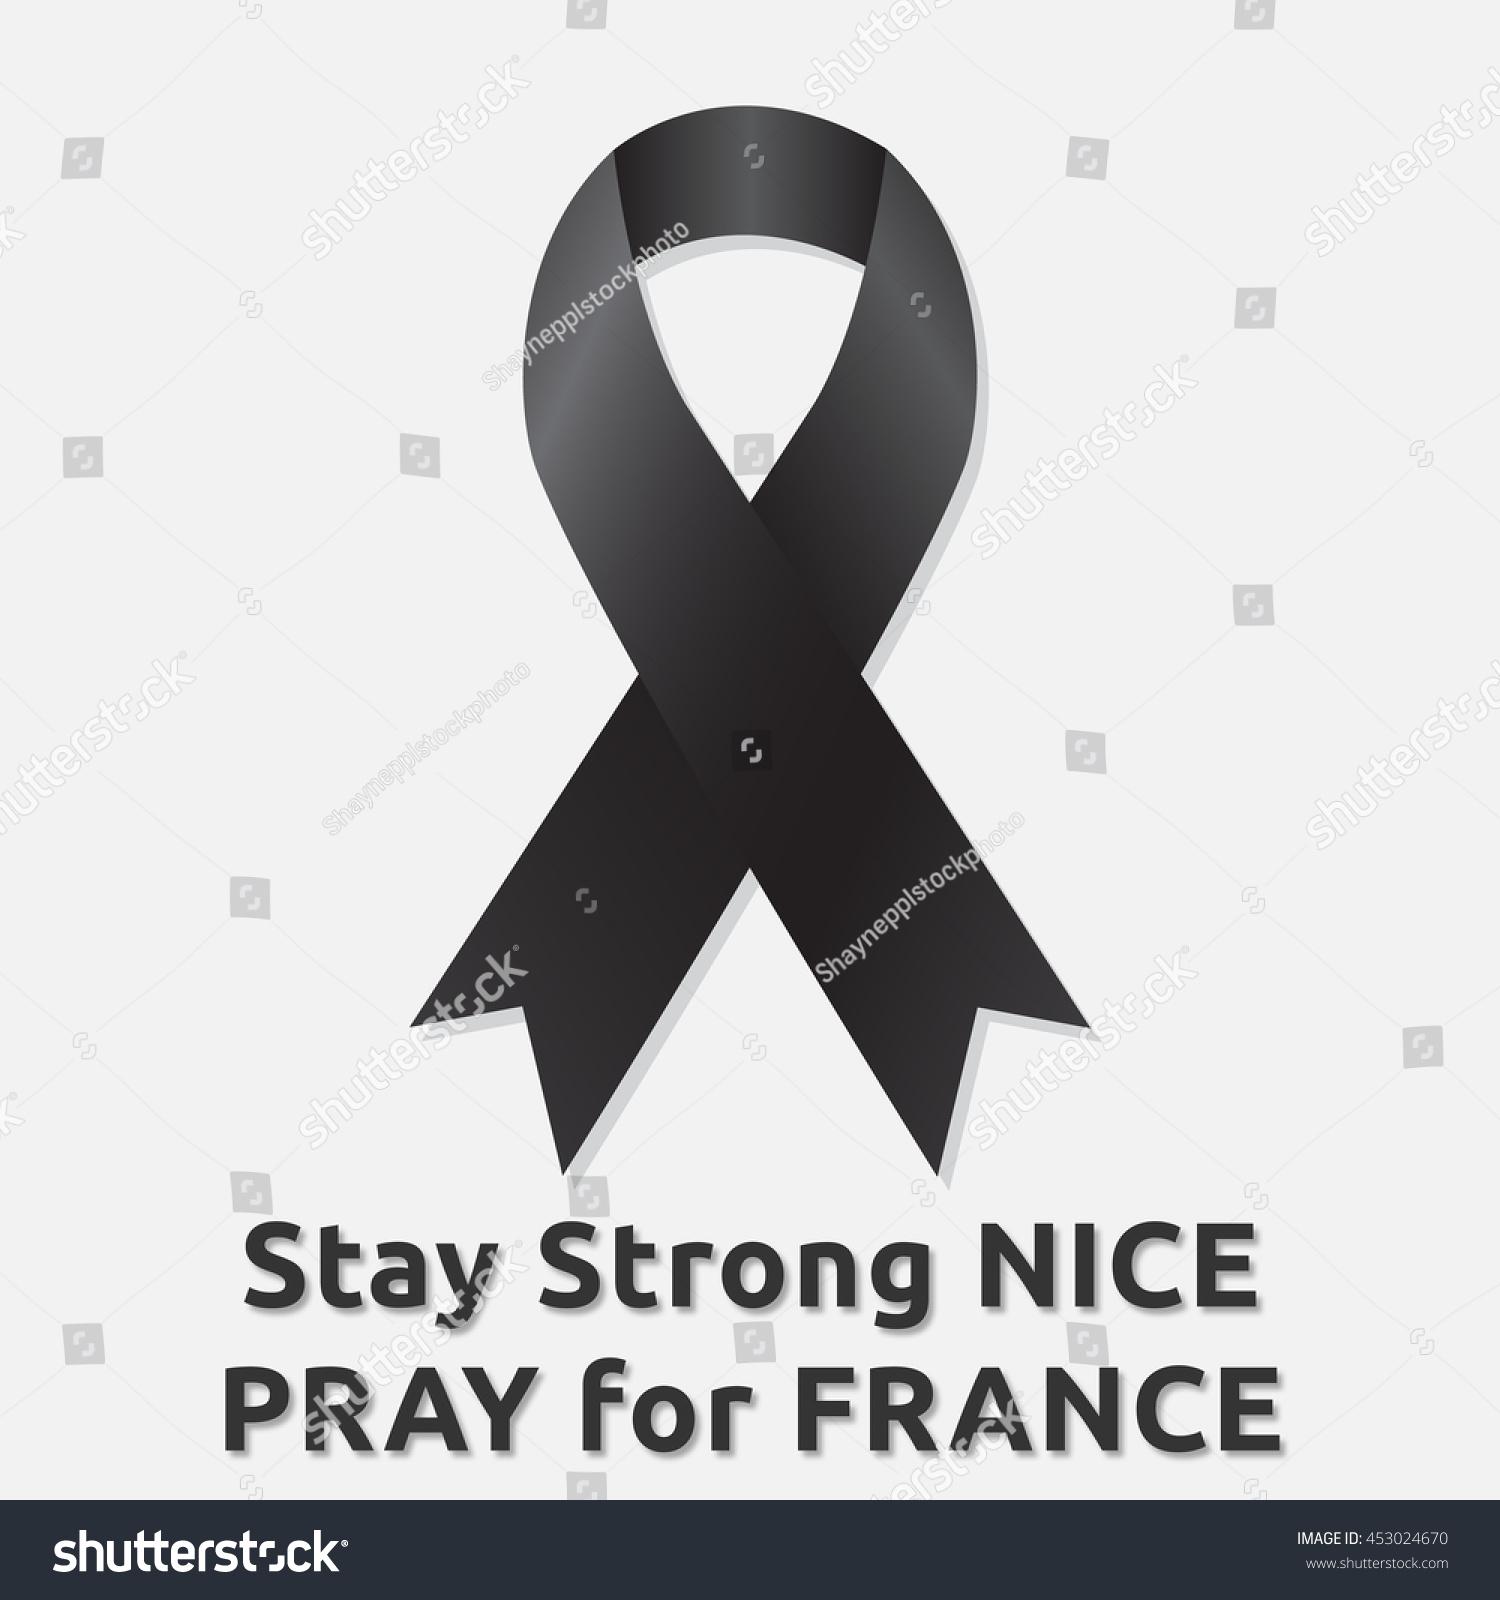 Stay Strong Nice Pray France Terrorism Stock Illustration 453024670